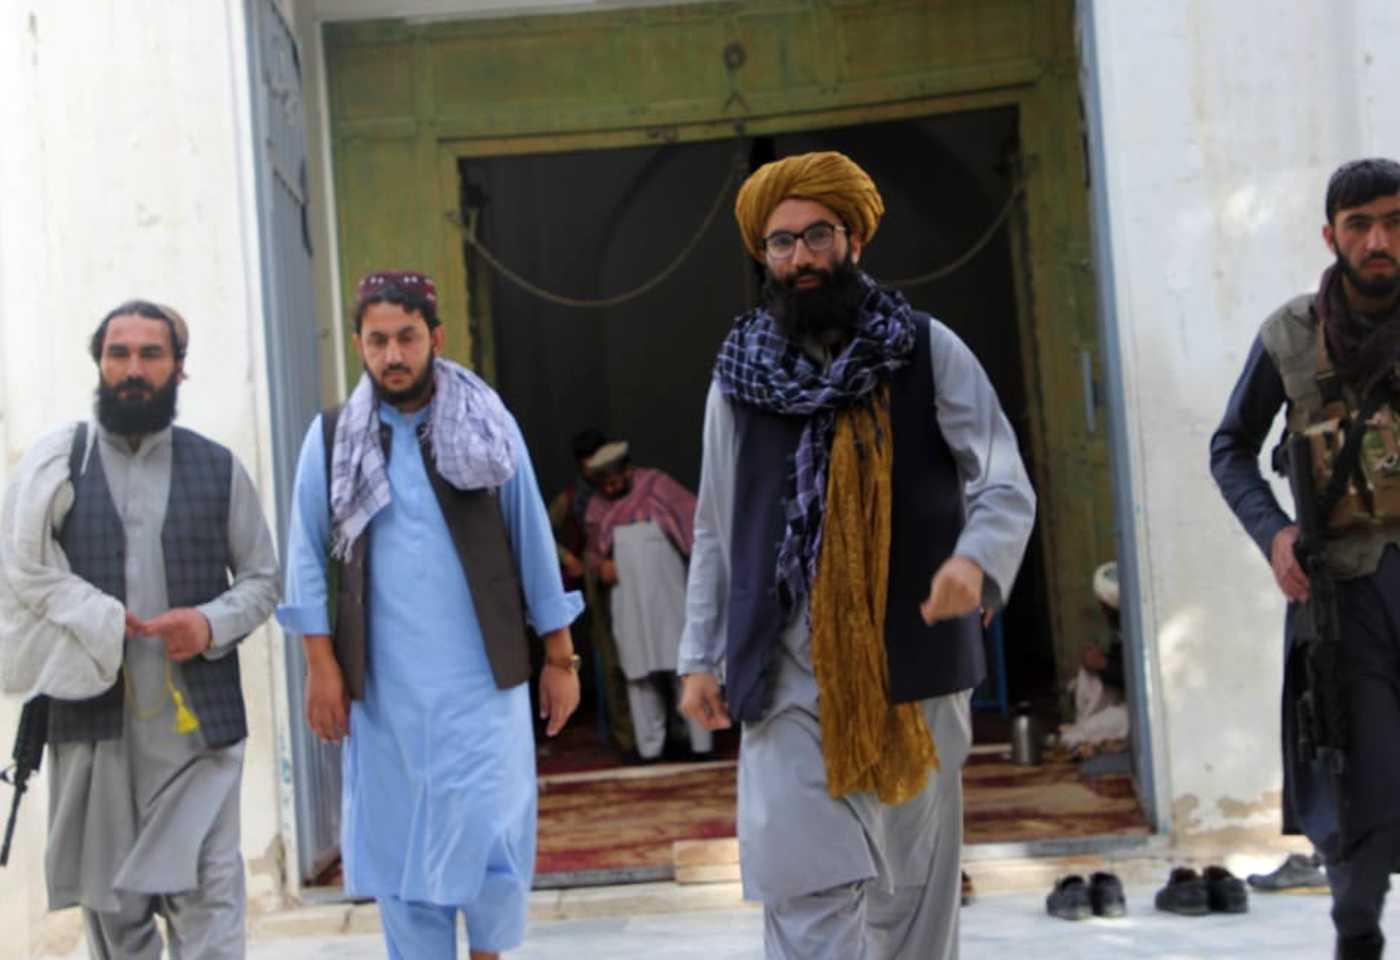 Taliban leader Anas Haqqani hails Mahmud Ghaznavi for breaking Somanth idol, angered Indians strike back